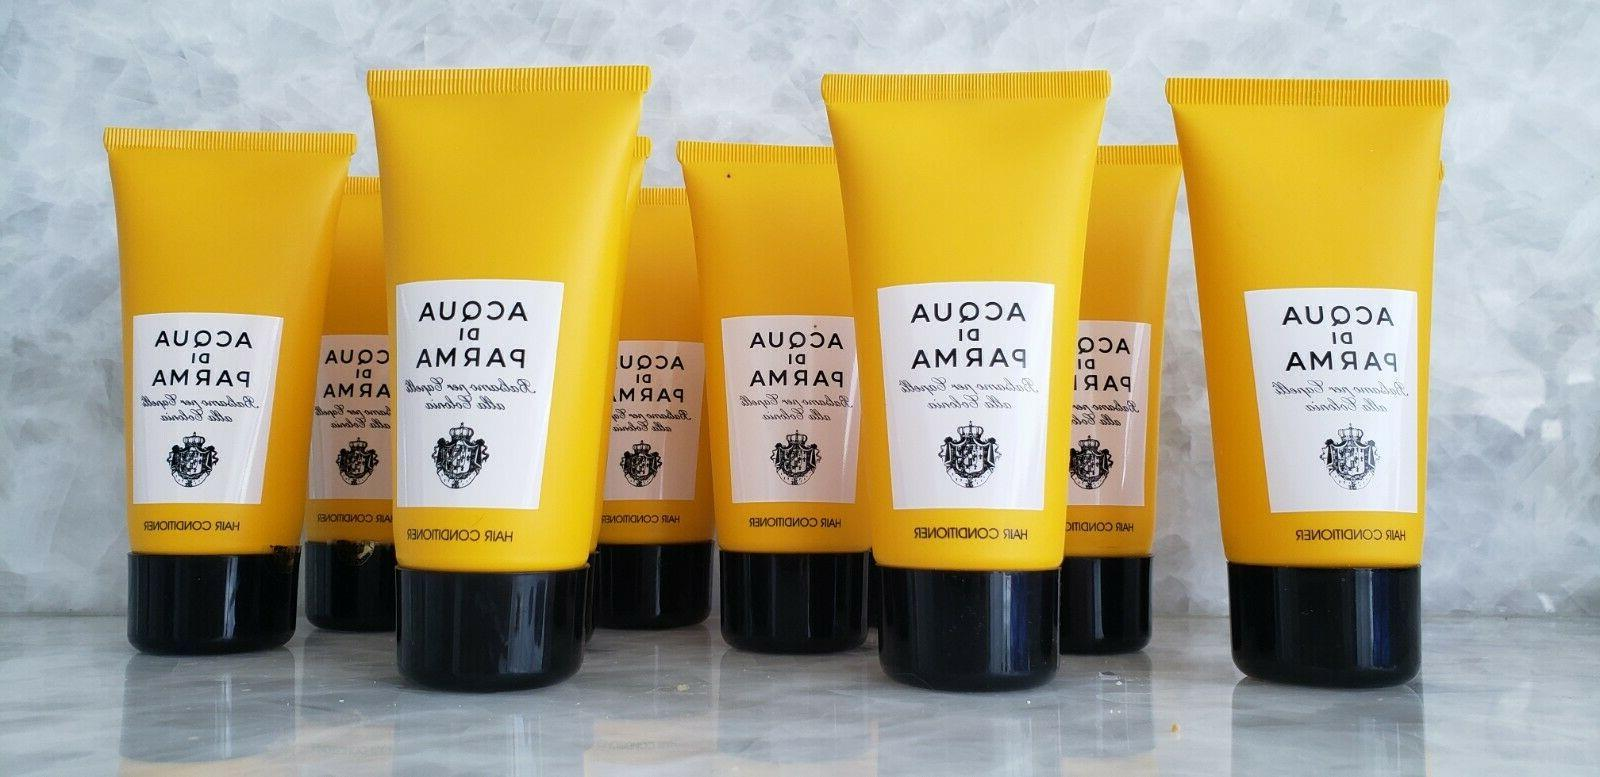 shampoo conditioner body soap gel perfume various